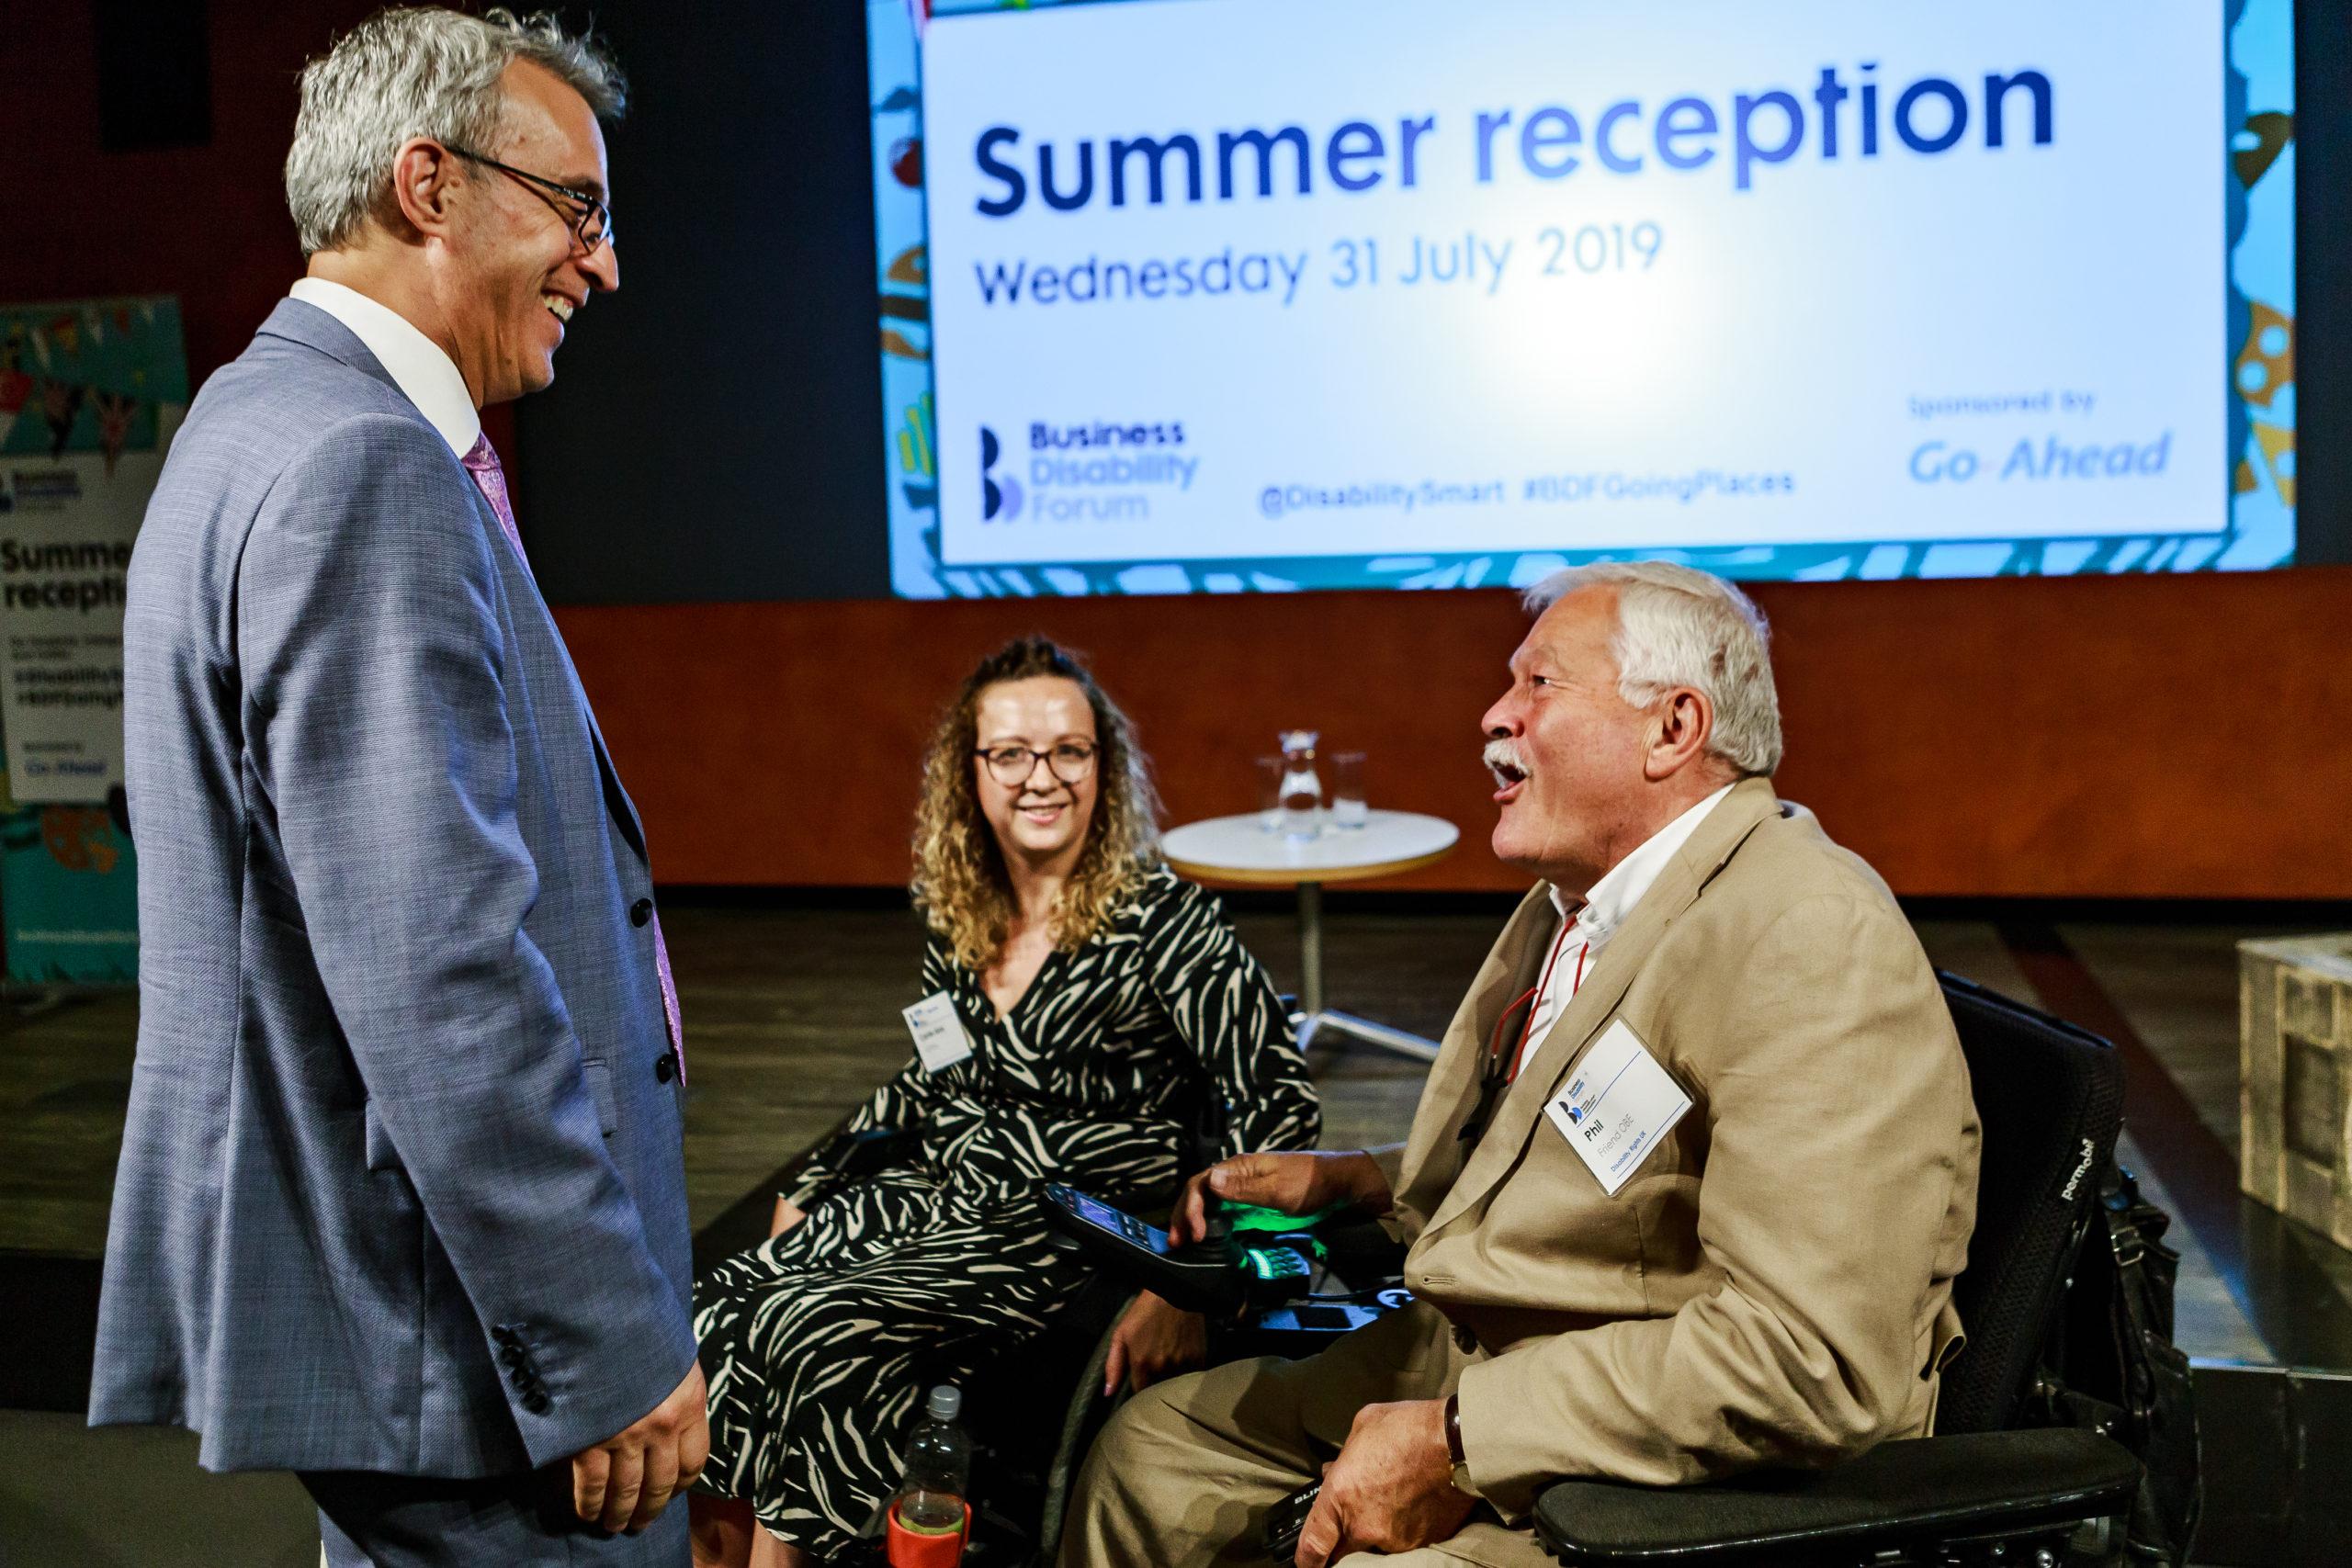 Business Disability Forum Summer Reception 2019